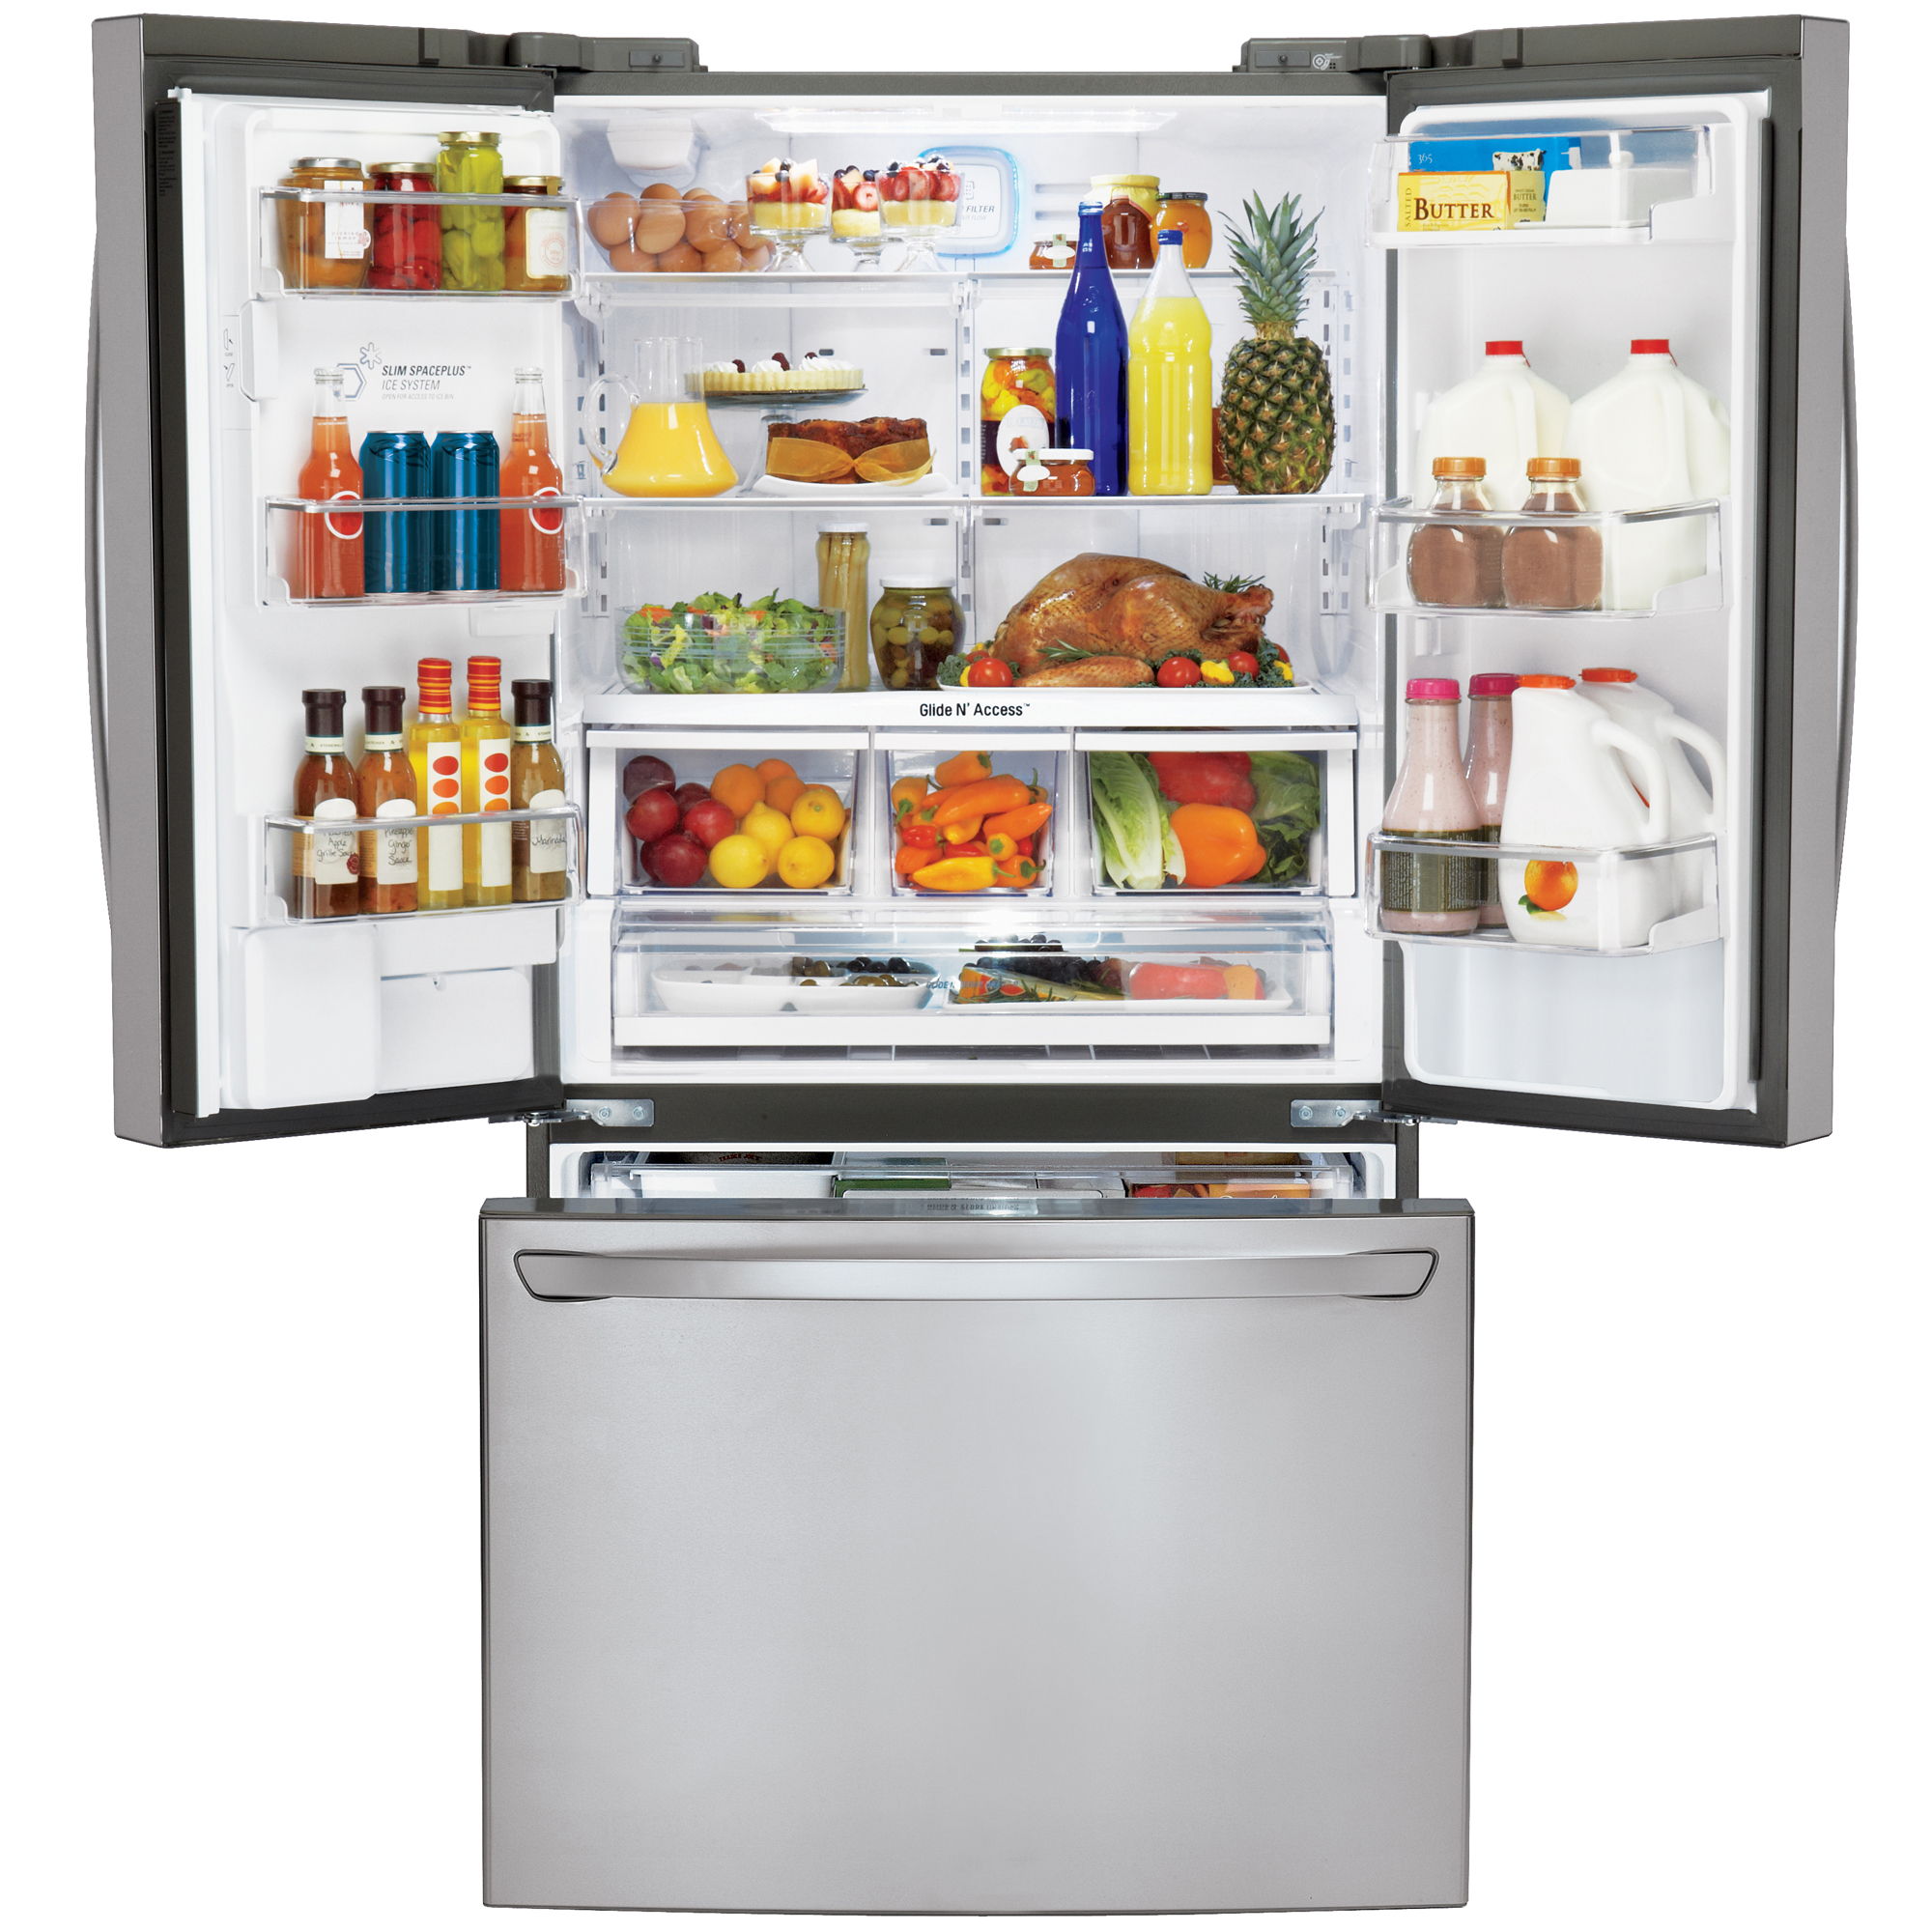 LG LFXS30726S 29.8 cu. ft. Super-Capacity French Door Refrigerator w/ Smart Cooling Plus